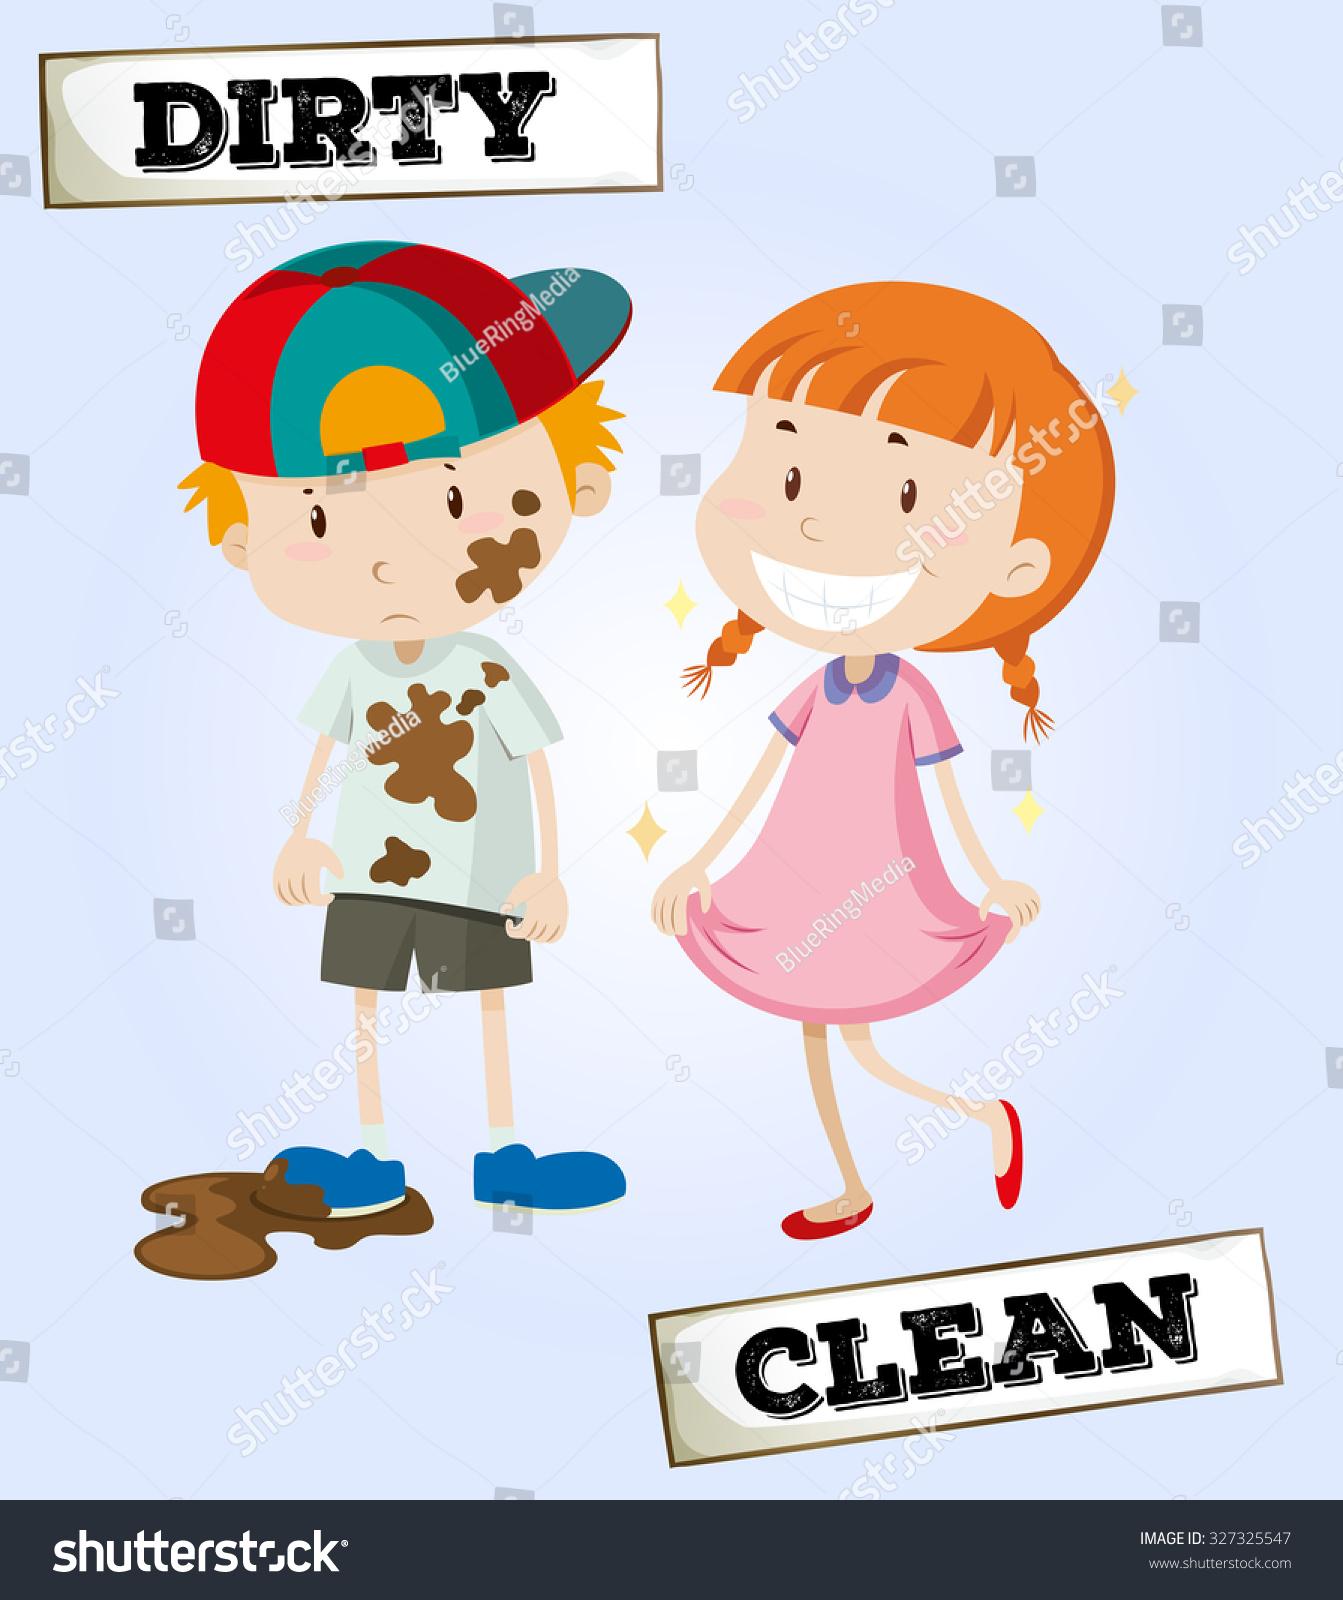 Dirty Boy Clean Girl Illustration Stock Vector 327325547 ... (1343 x 1600 Pixel)